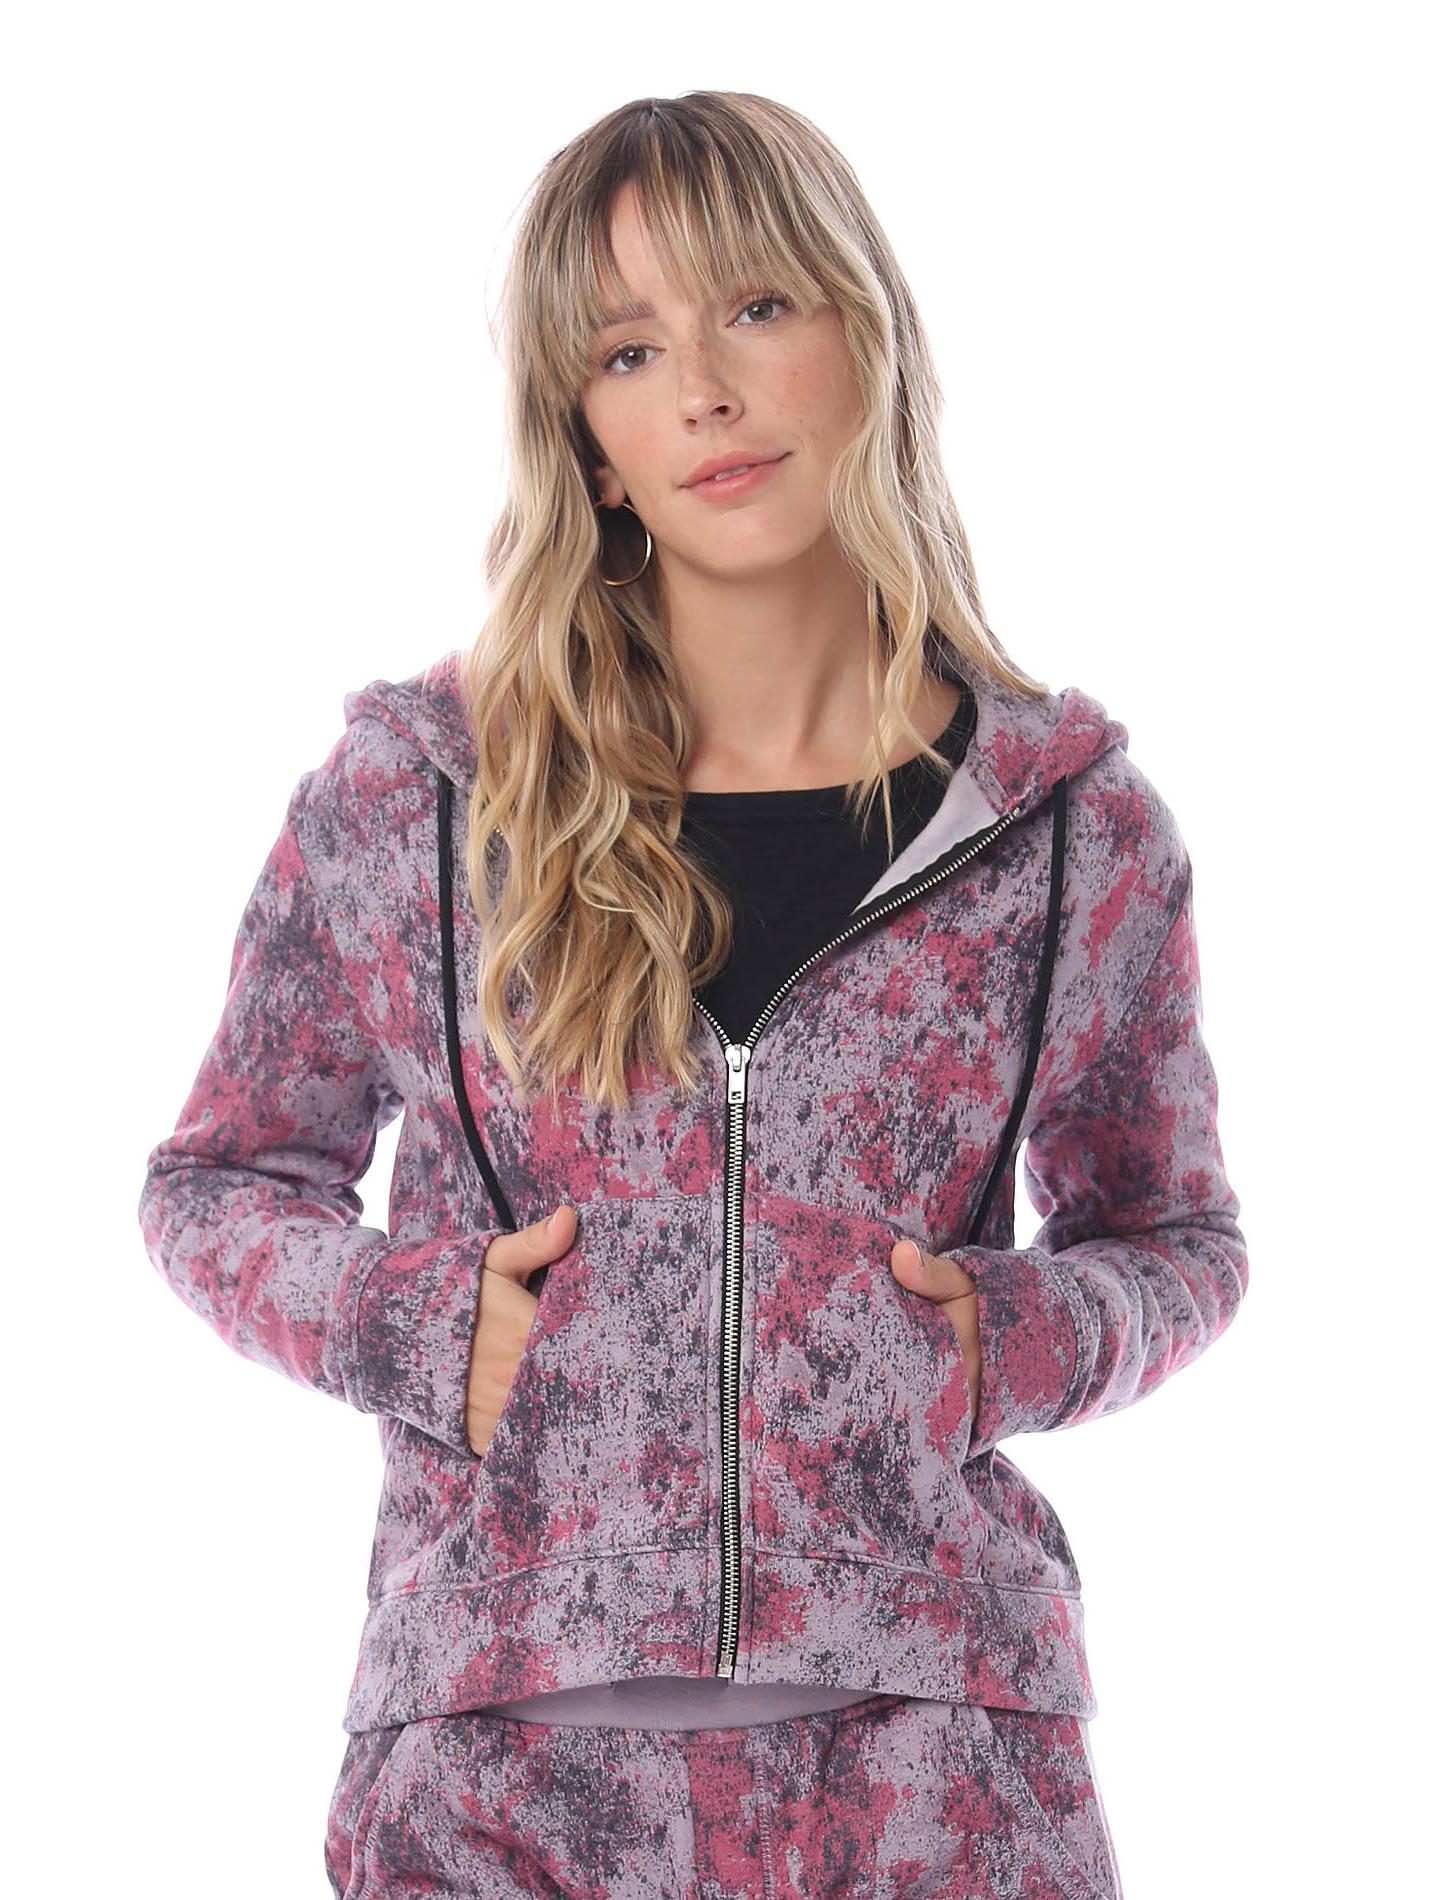 Chelsea Printed Eco-Fleece Full-Zip Hoodie, $68 & Printed Eco-Fleece Jogger Pants $58 @alternativeapparel.com